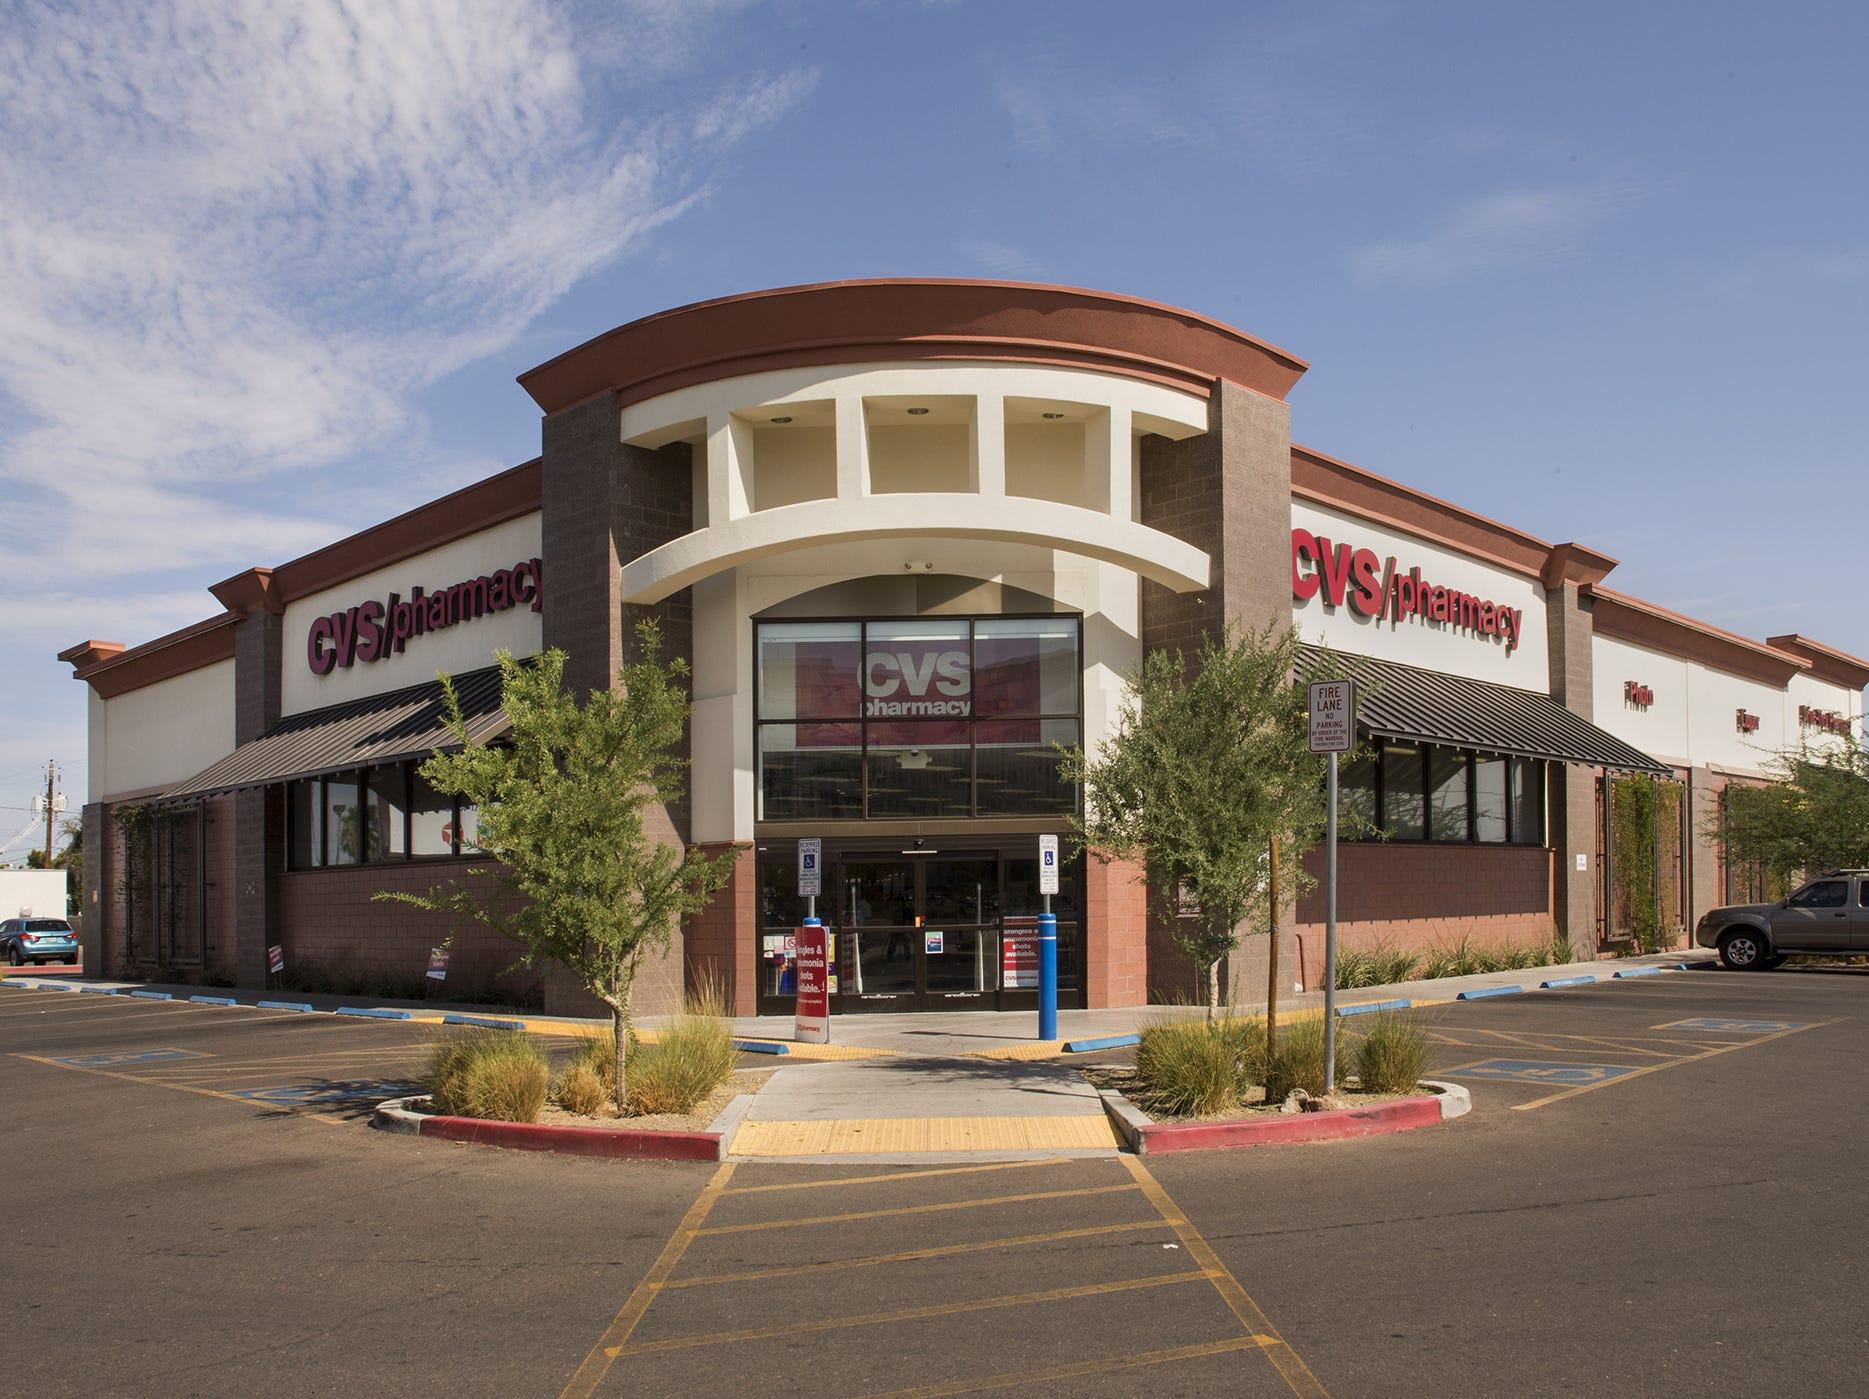 No. 7: CVS Health | Retail pharmacies, benefits management | 2019 employees: 12,100 | 2018 employees: 8,000 | Ownership: Public | Headquarters: Woonsocket, Rhode Island | www.cvshealth.com